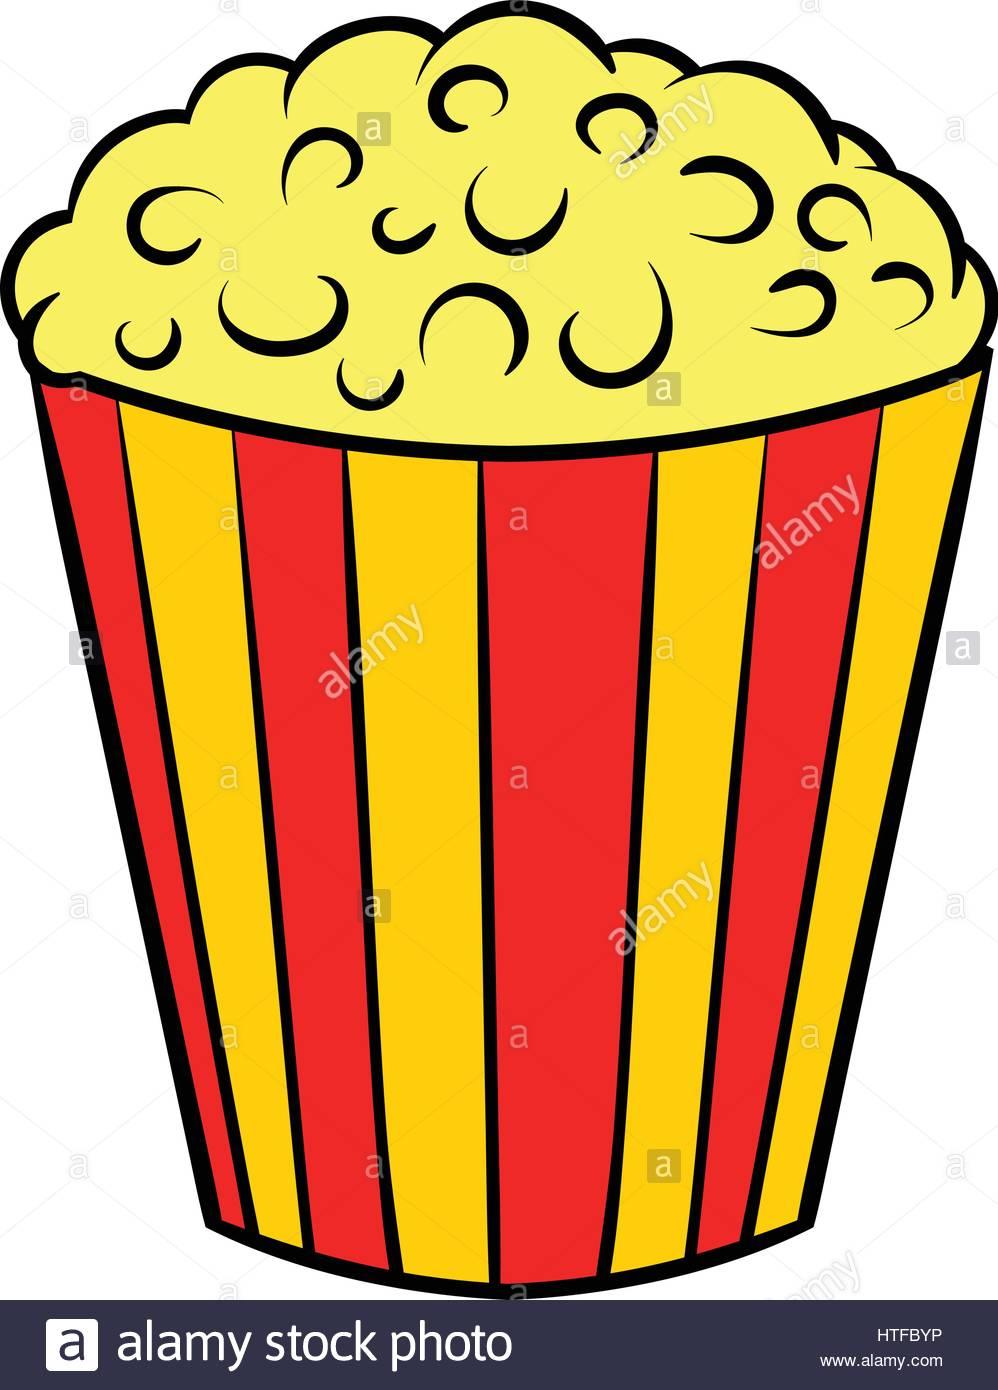 998x1390 Popcorn Icon Cartoon Stock Vector Art Amp Illustration, Vector Image